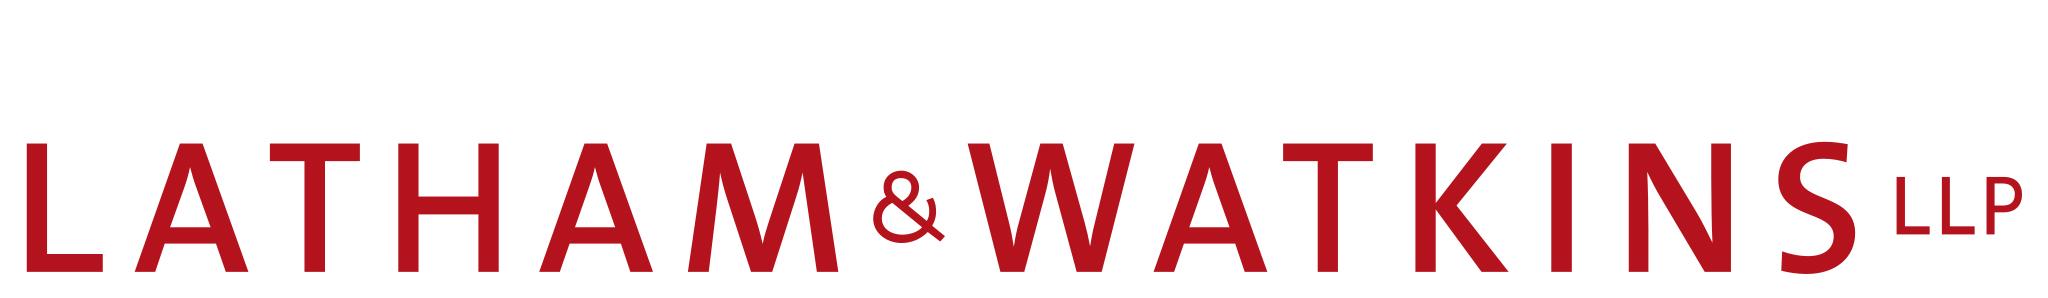 2000px-Latham__Watkins_Logo.jpg